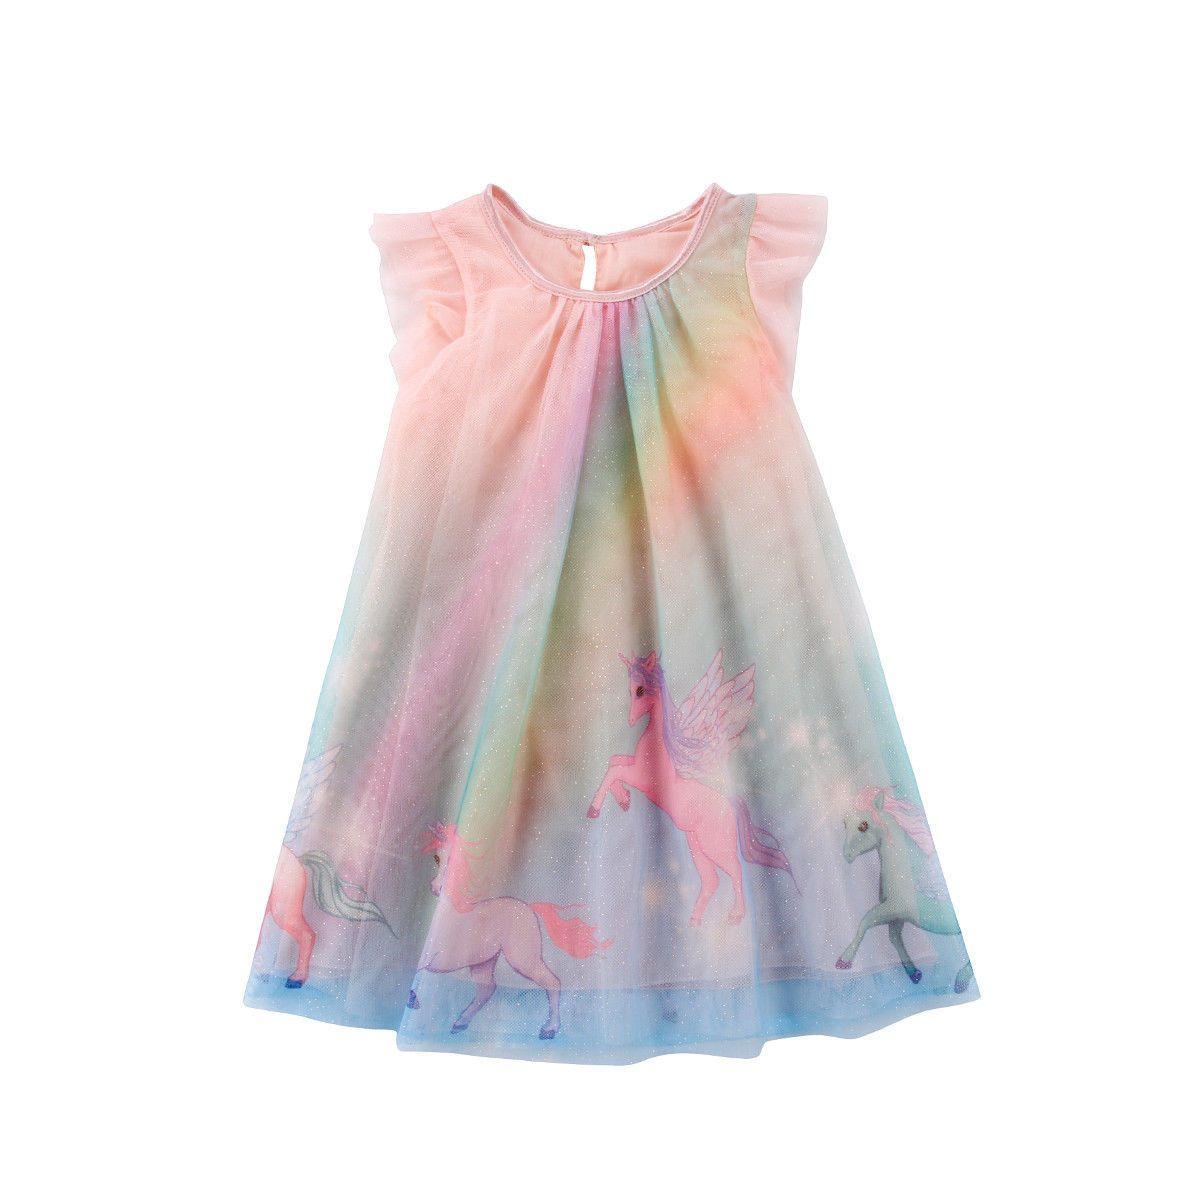 RetailBaby Girls Pegasus Unicorn Printed Dress Sleeveless Rainbow grenadine Cartoon A-line Party Prom Princess Dresses Kids boutique clothes